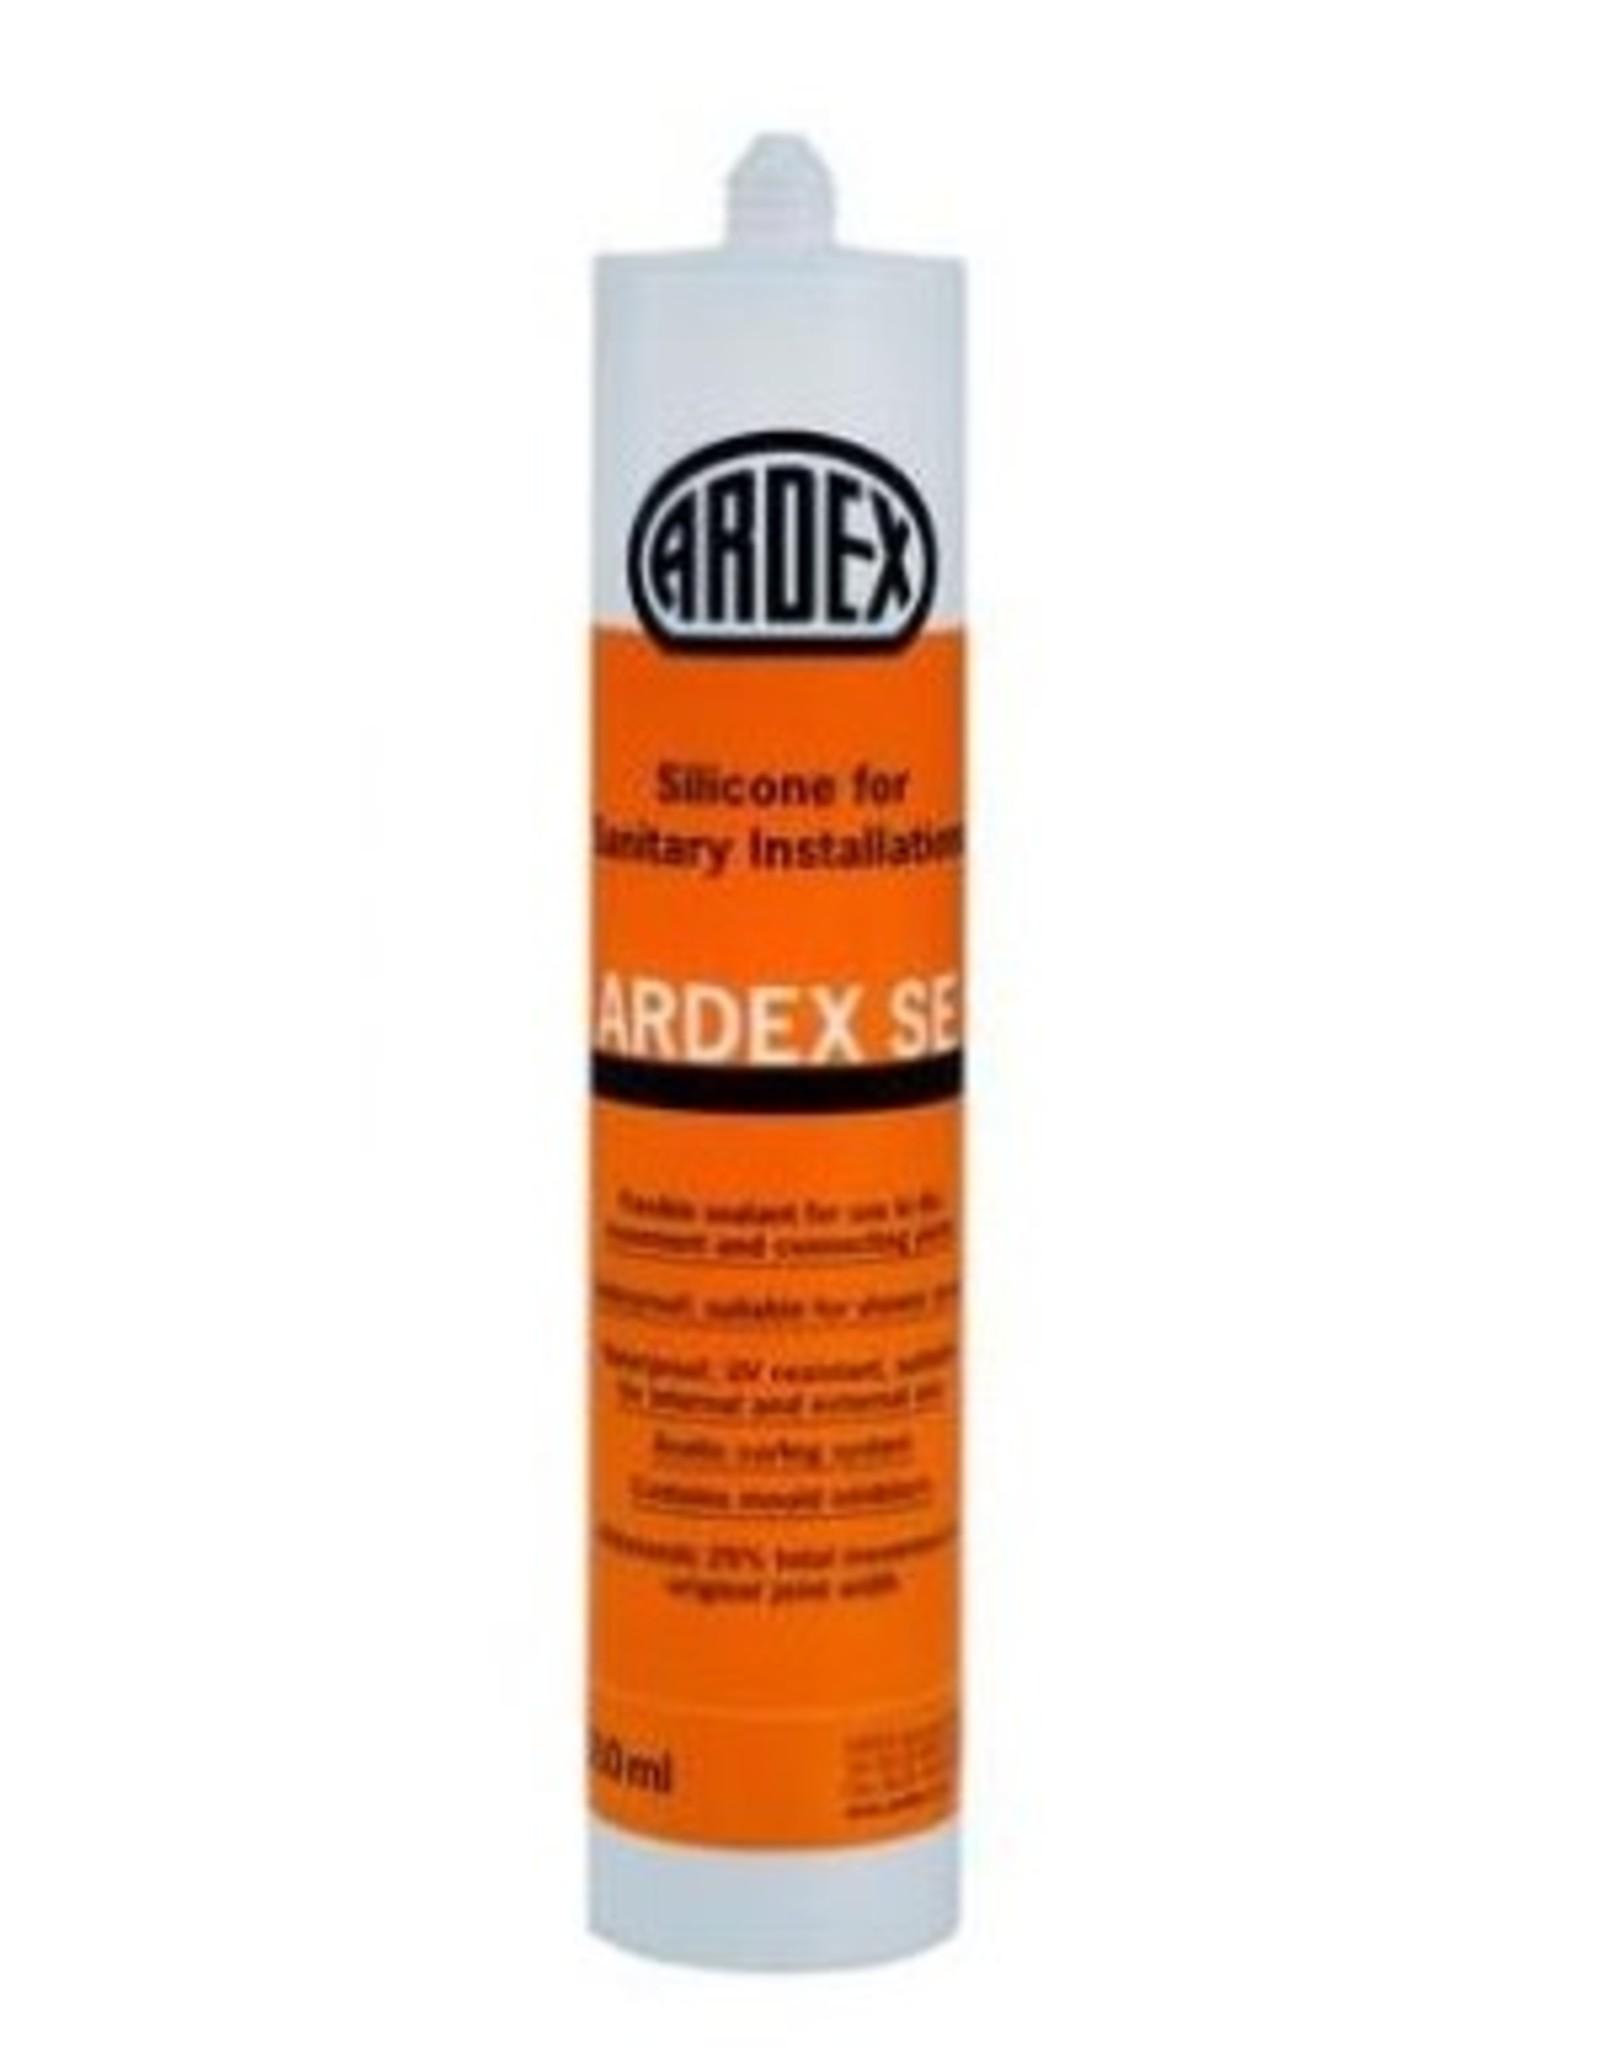 Ardex ARDEX SE Charred Ash 310mL Silicone